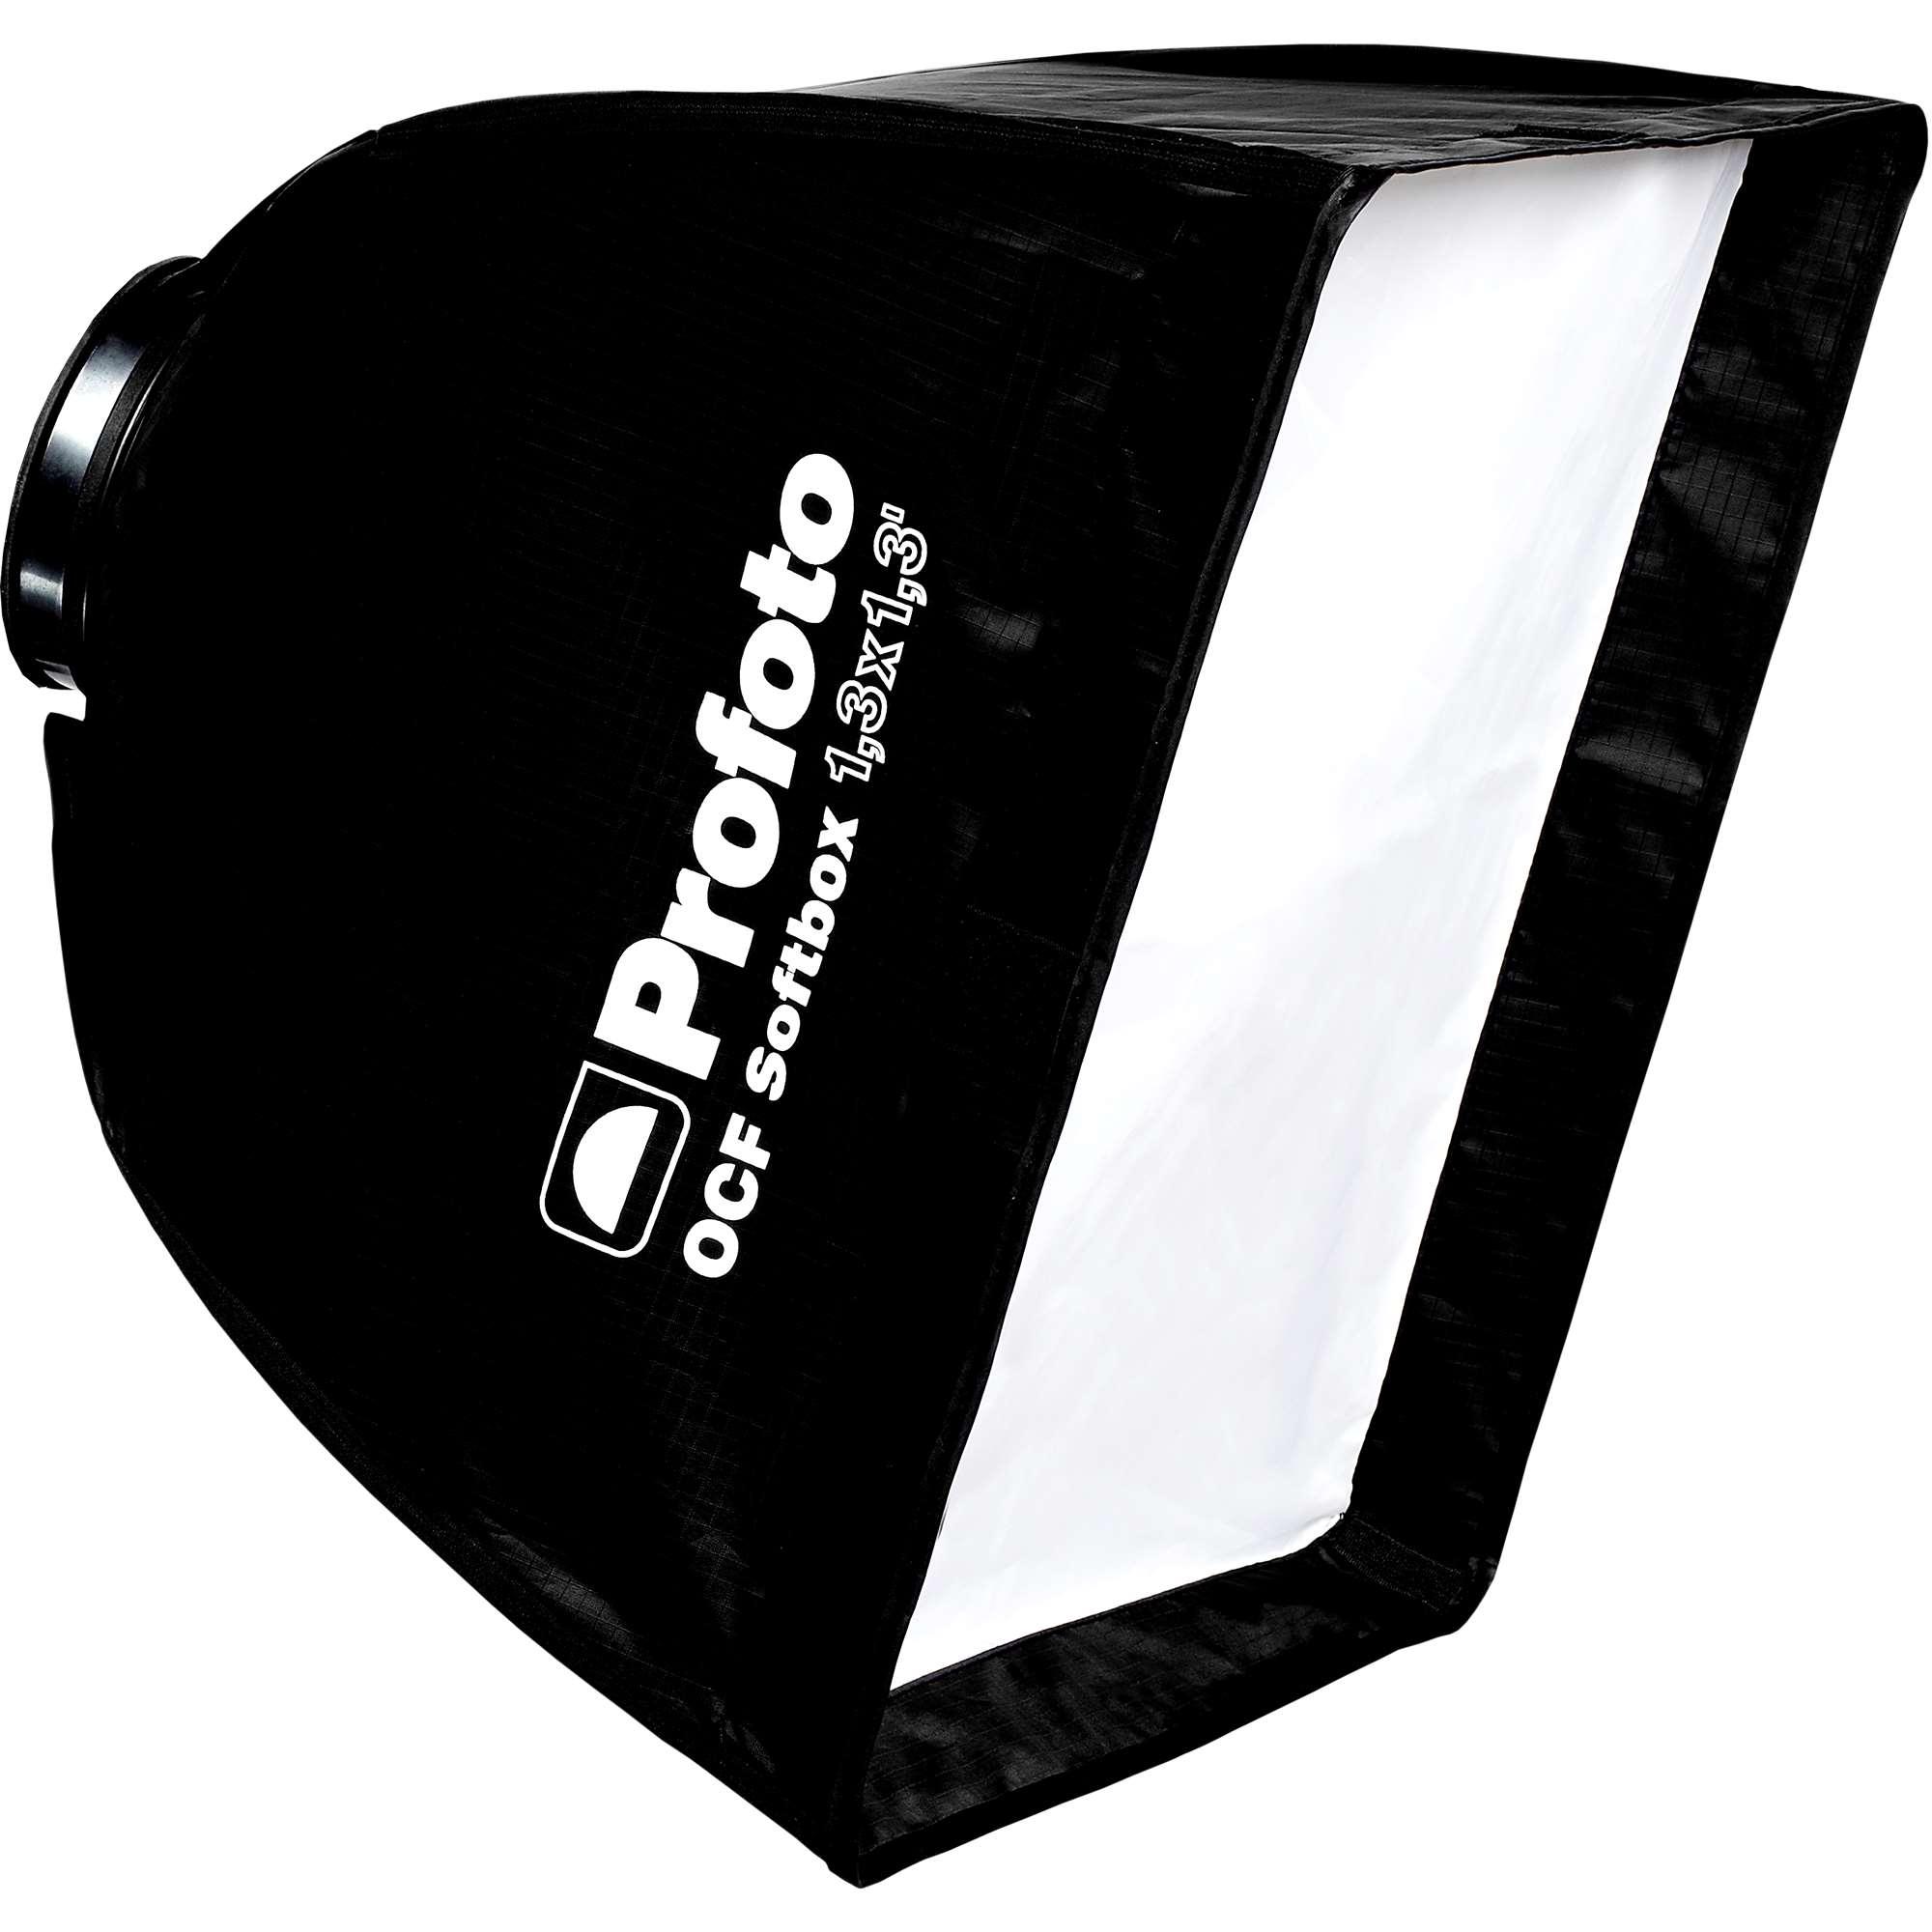 Profoto ocf softbox rectangular strip 1×3′ (101217)